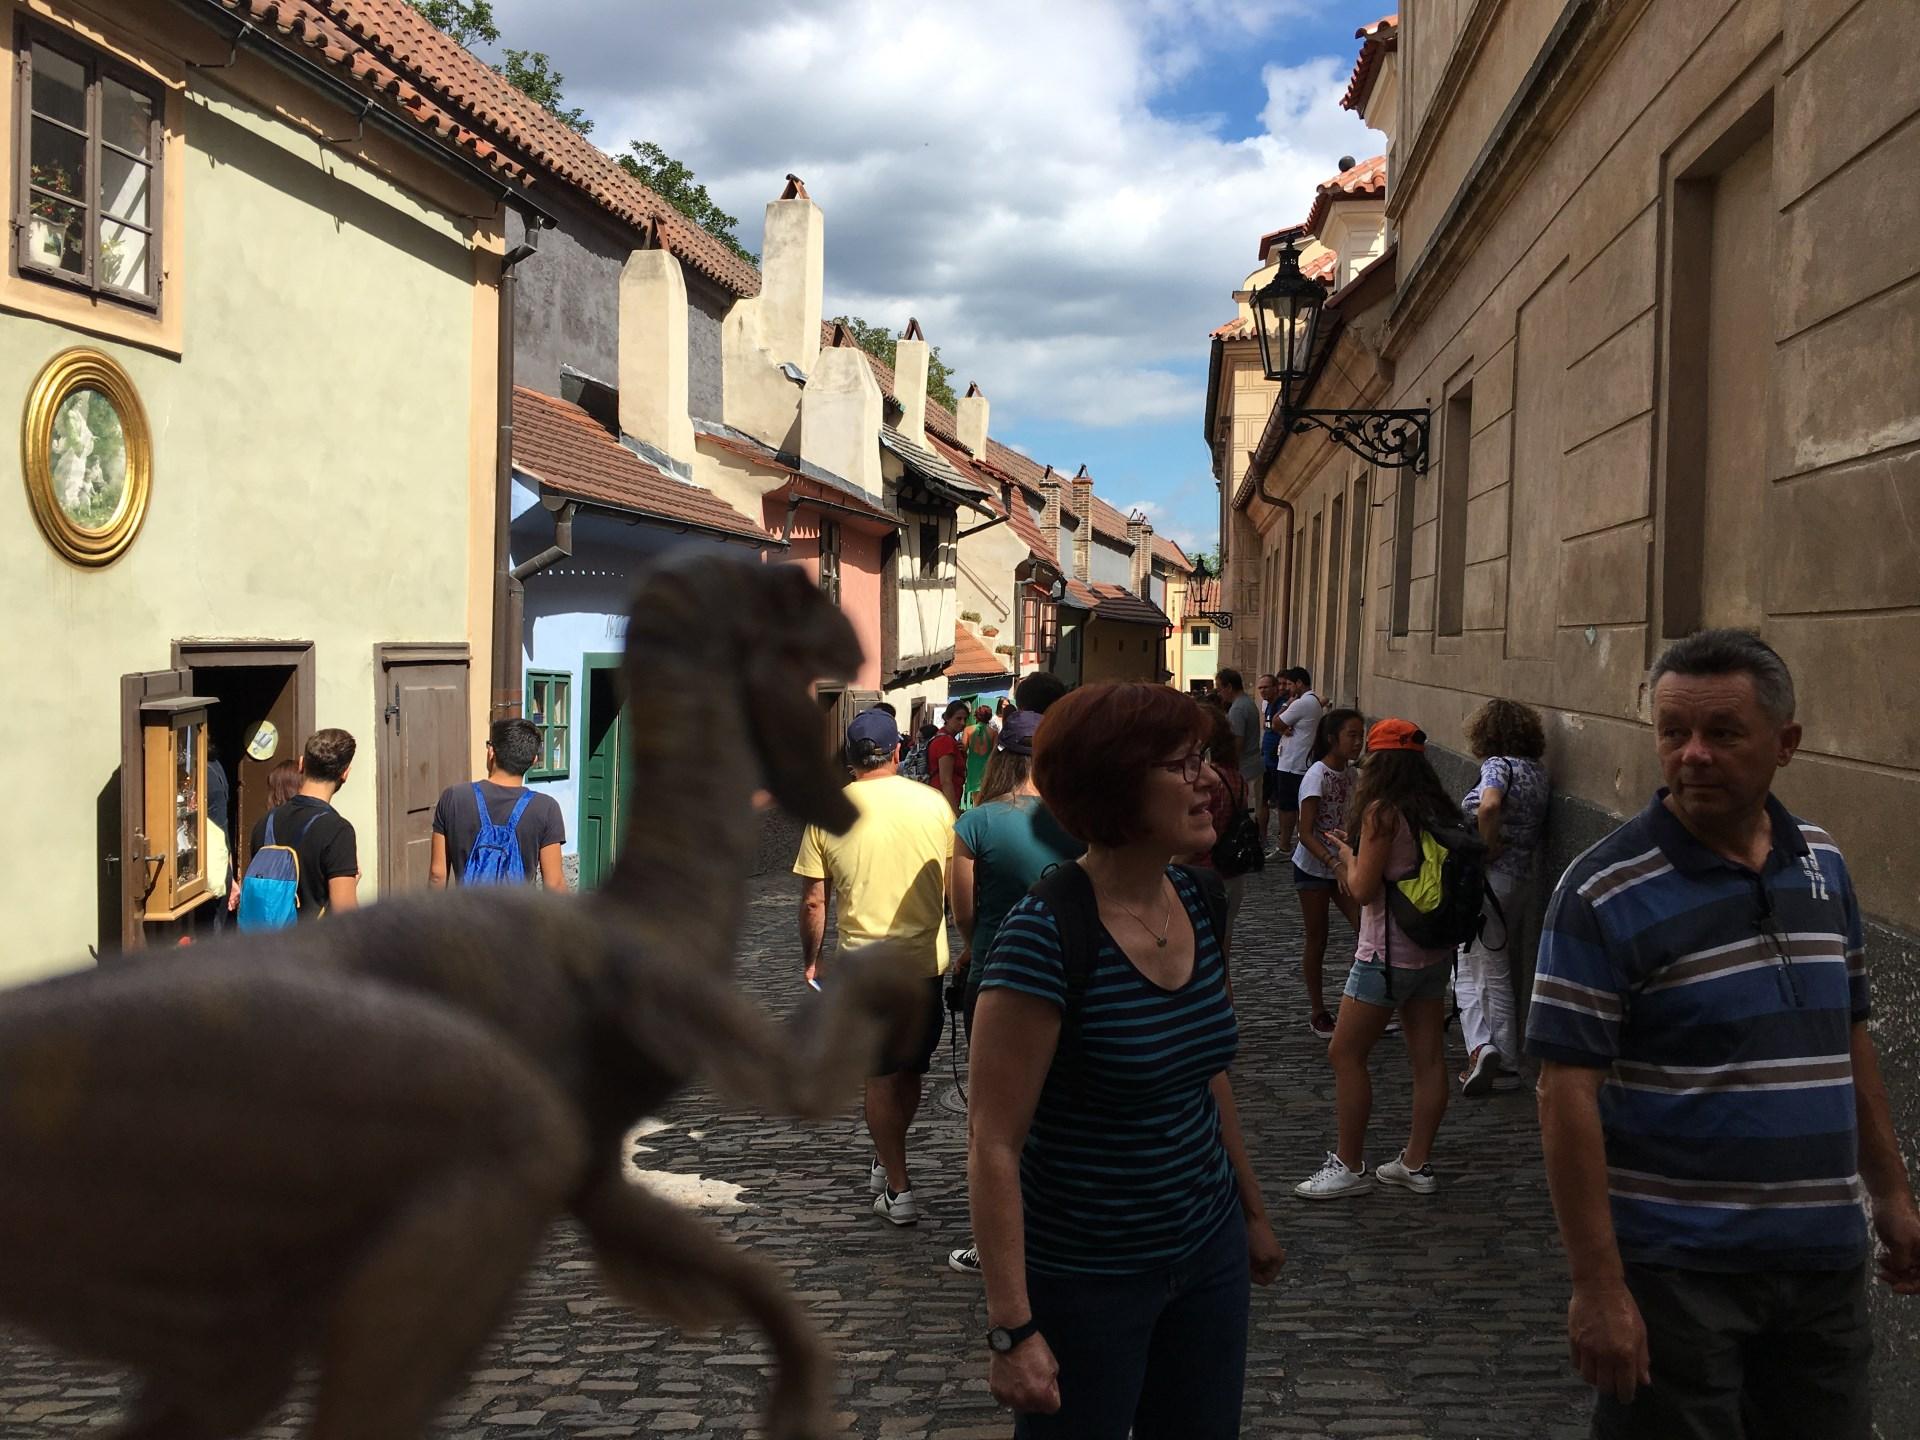 VelociraptorAttack en el Golden Lane de Praga